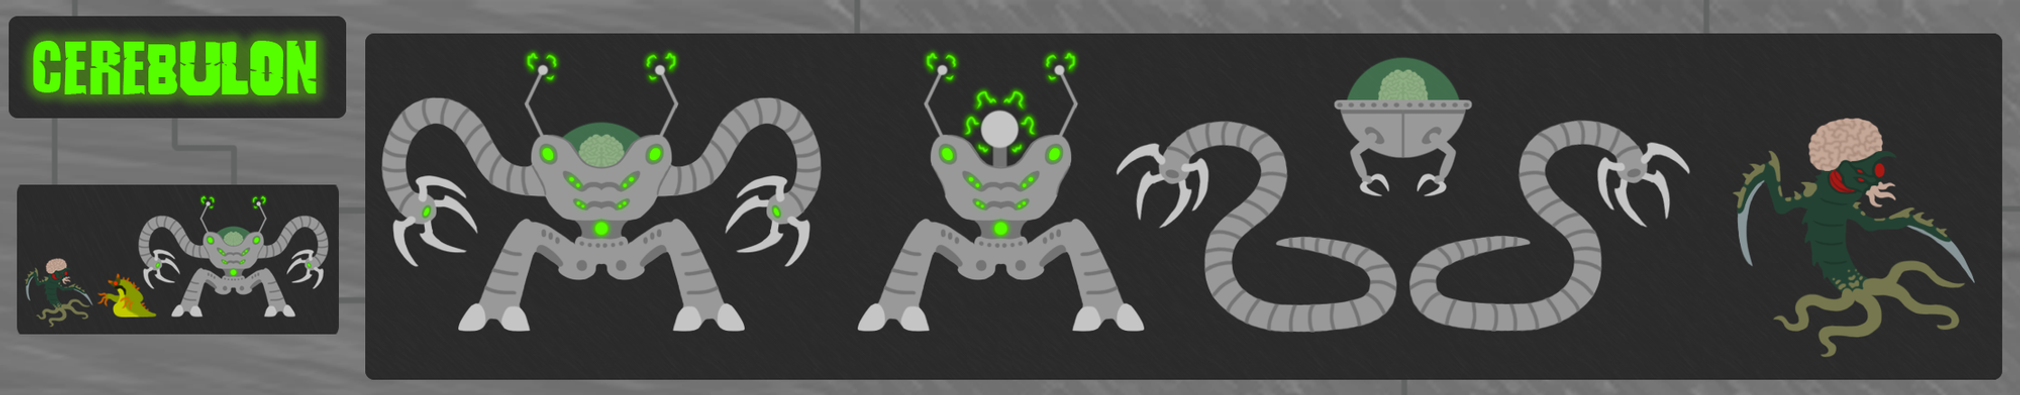 WOTM2: Final Boss by DinoHunter2